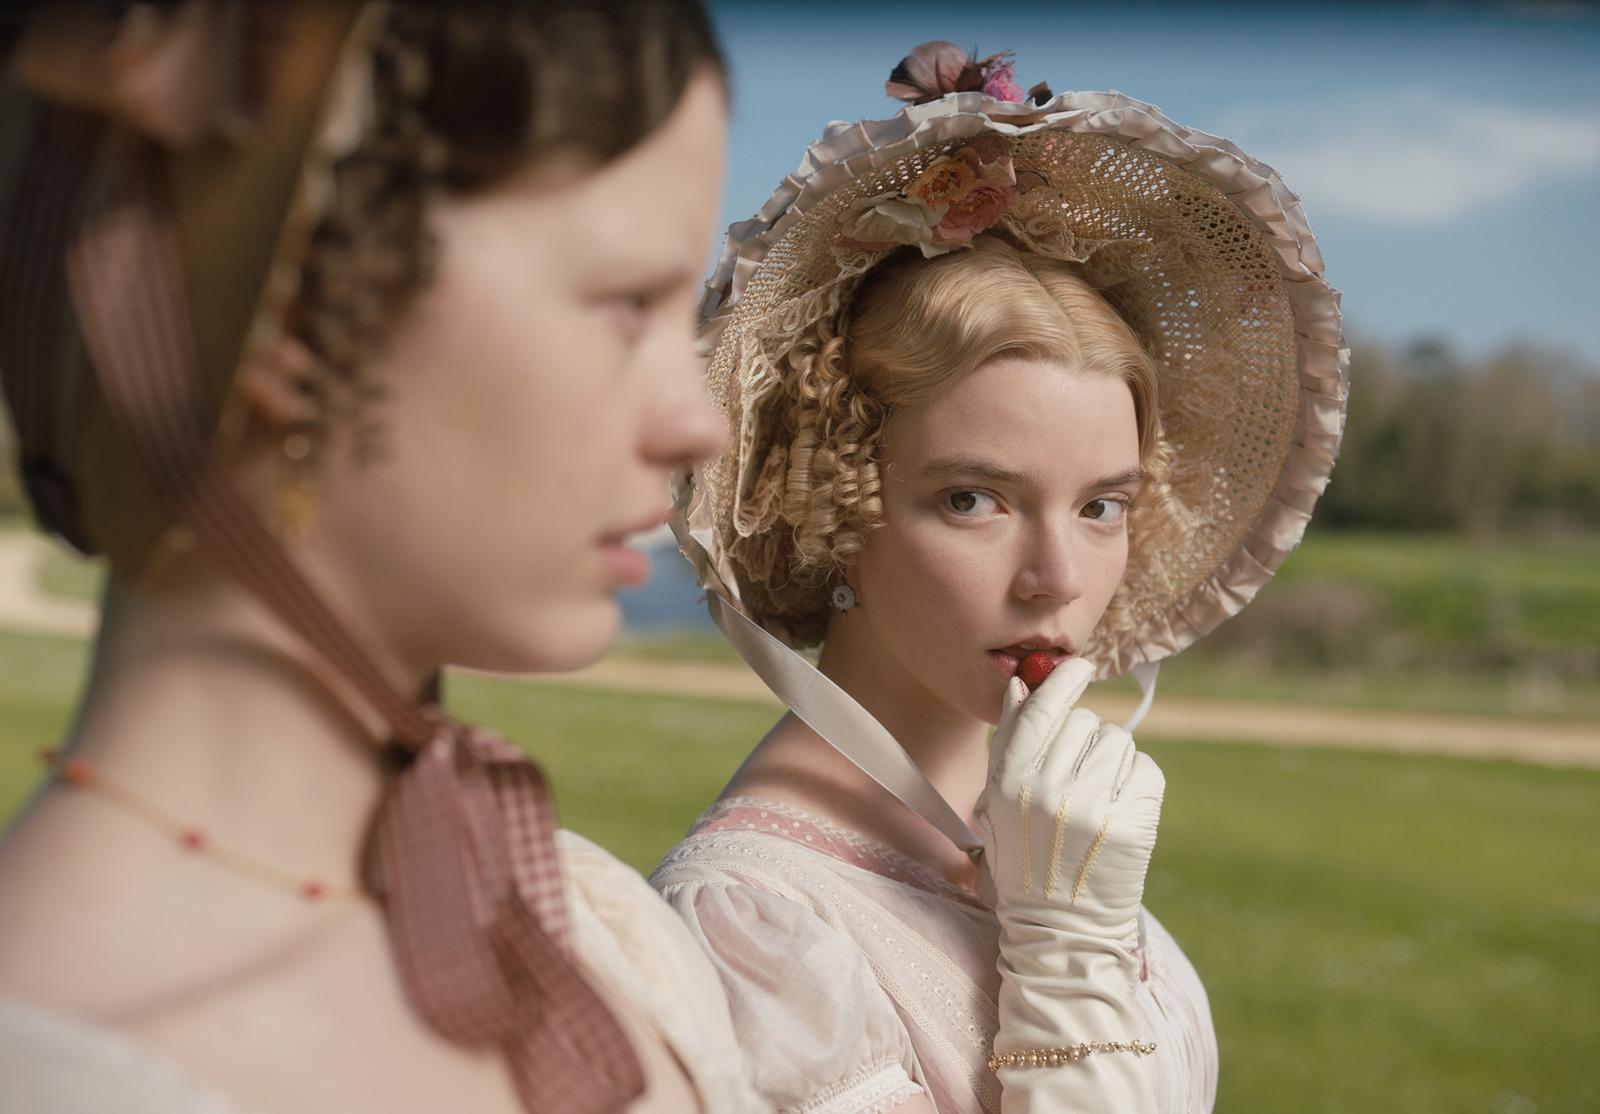 Emma d'Autumn de Wilde, avec Anya Taylor-Joy (2020) - Page 2 79396857_max